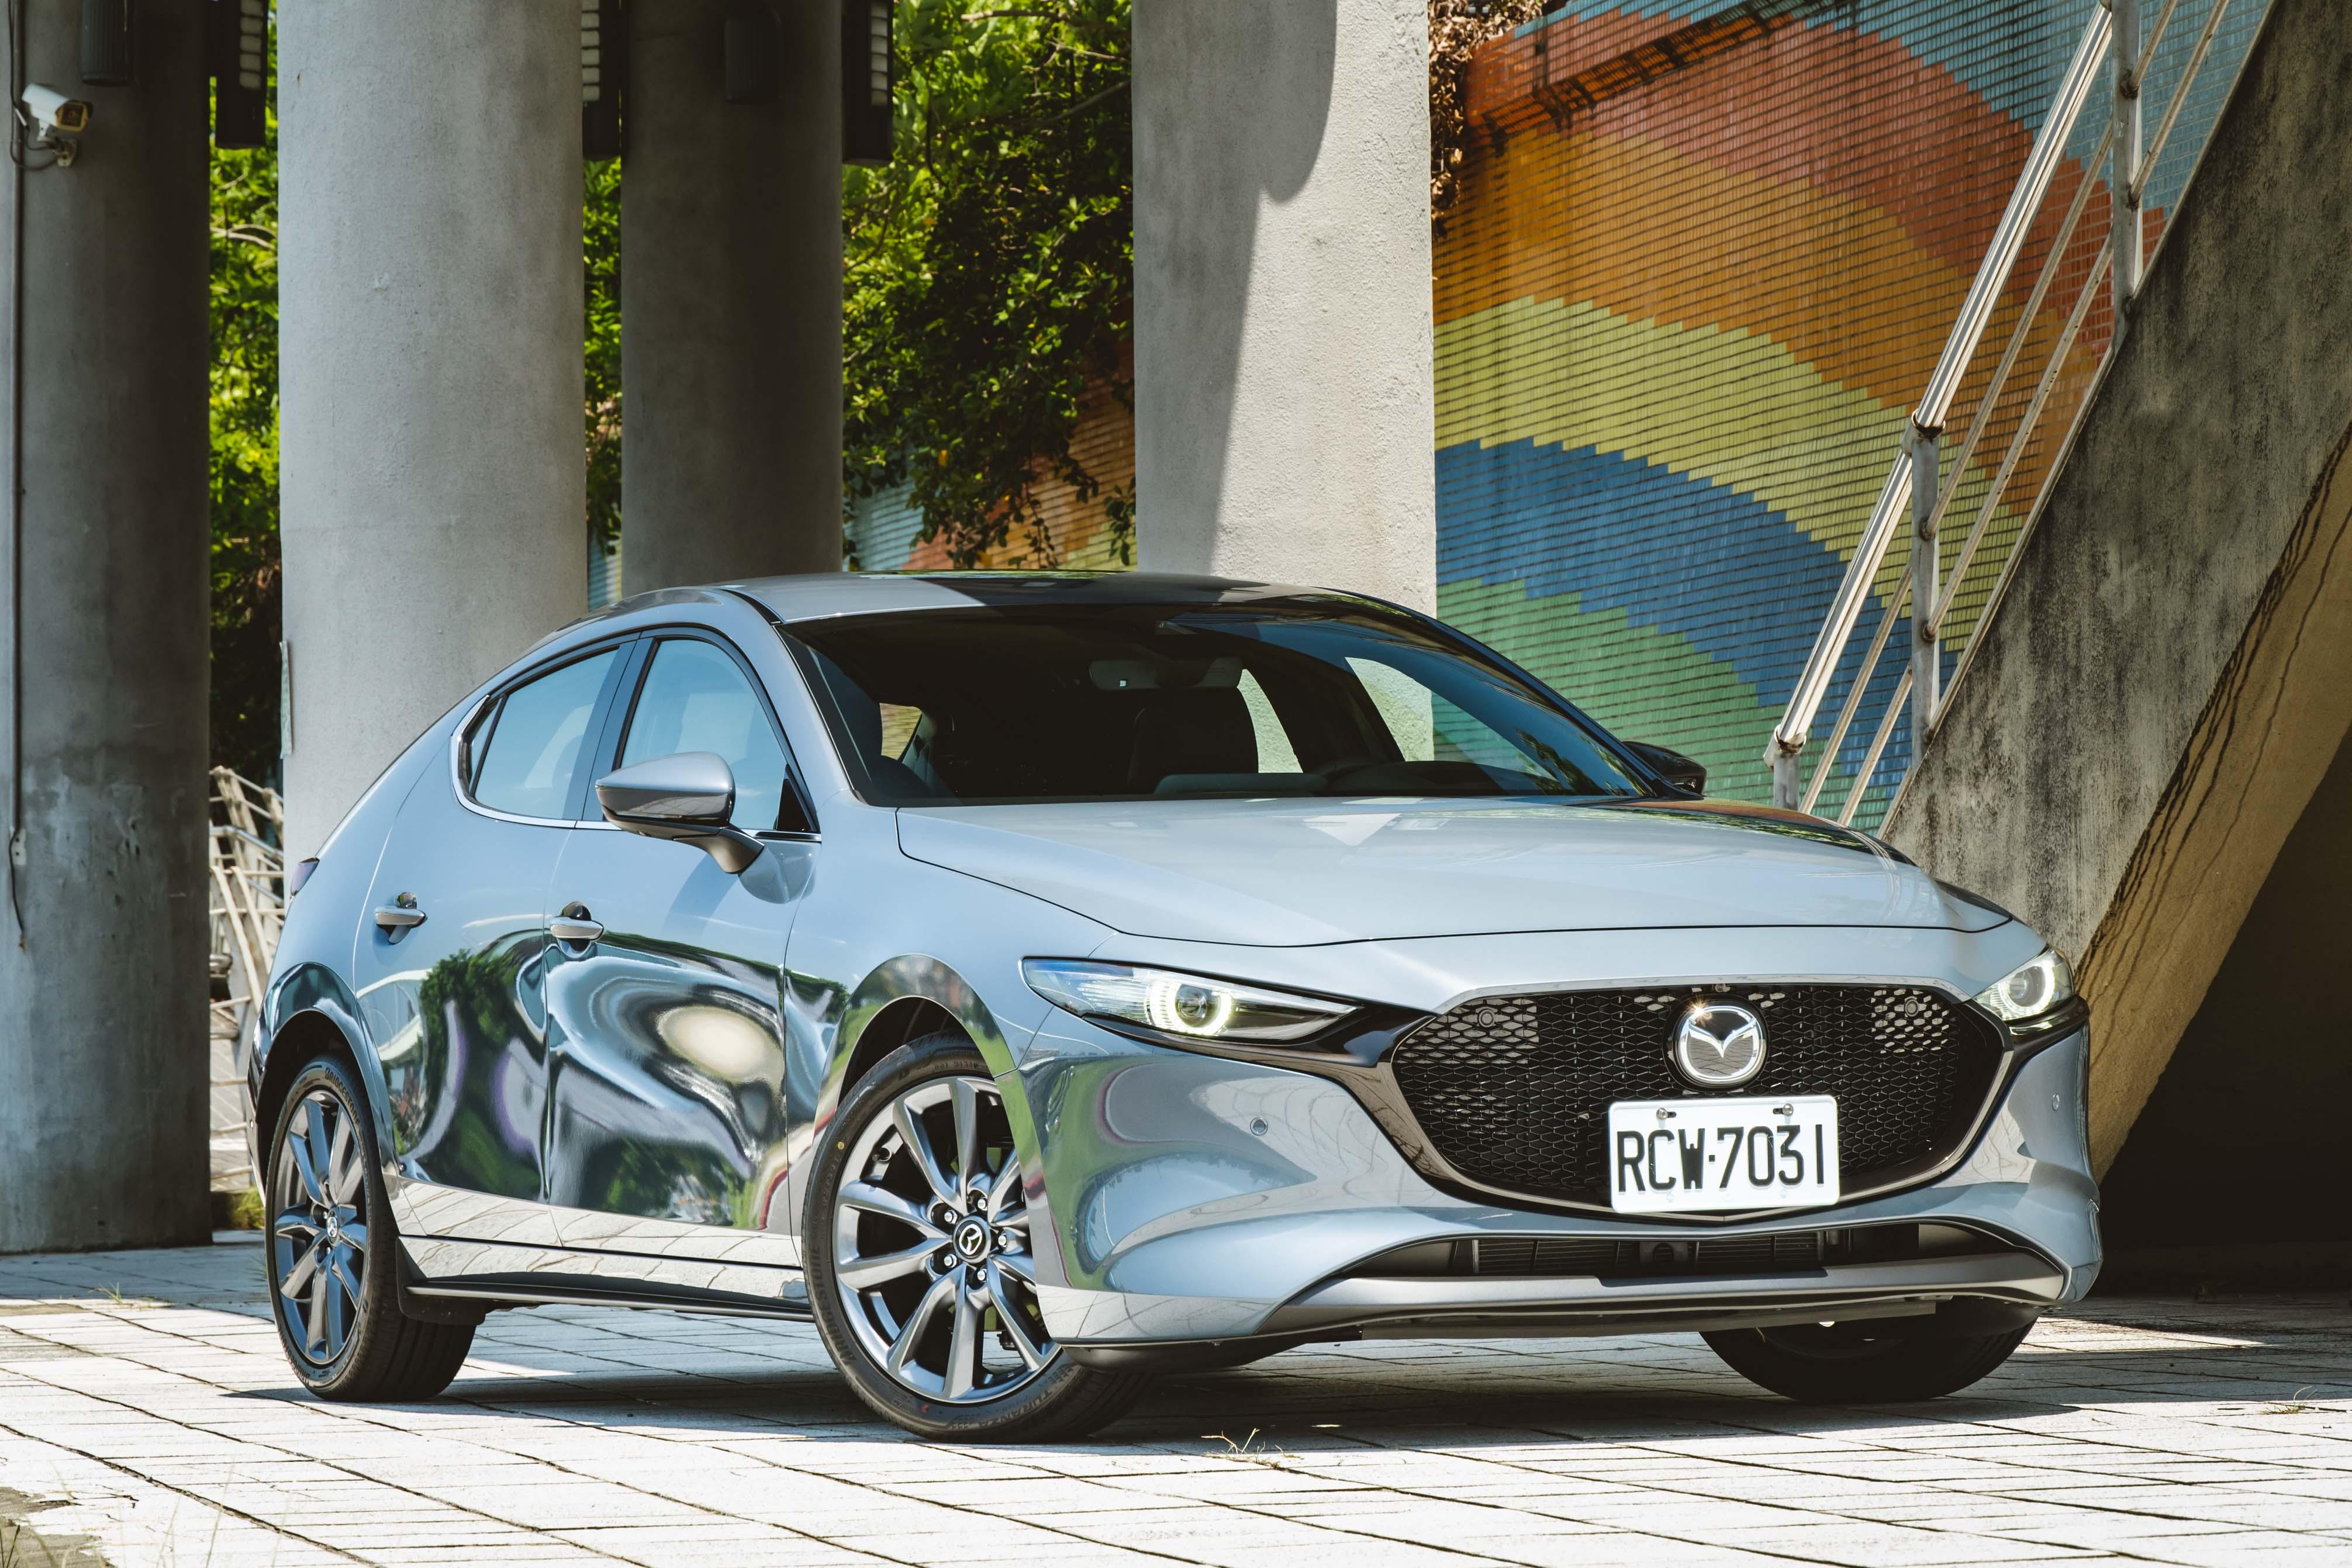 Mazda3 全車系標配 LED 頭燈,日行燈在頂級型以上才是 LED。